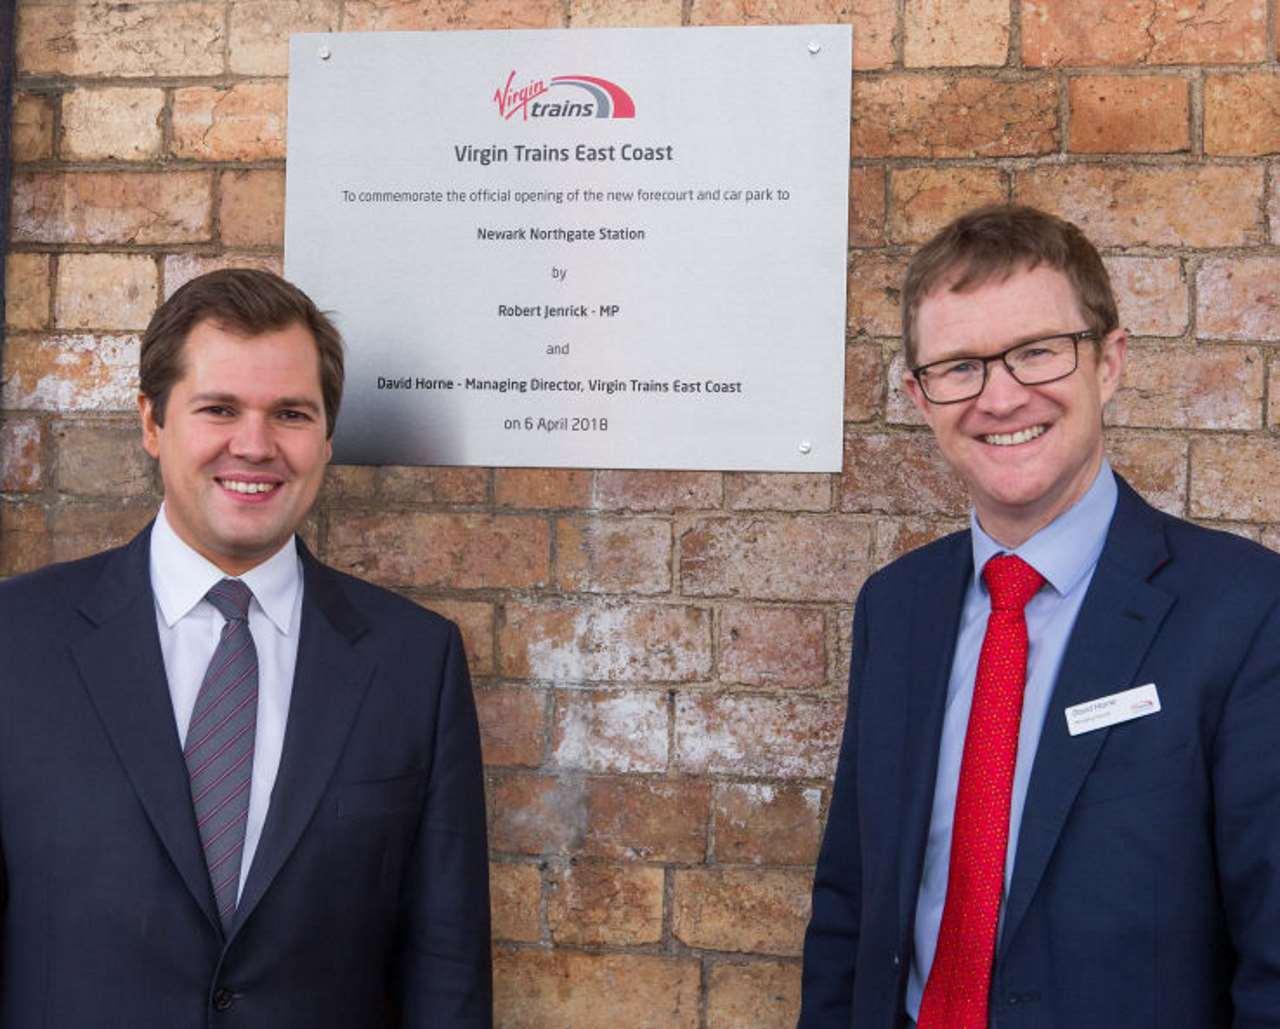 Virgin Trains reveal new newark northgate